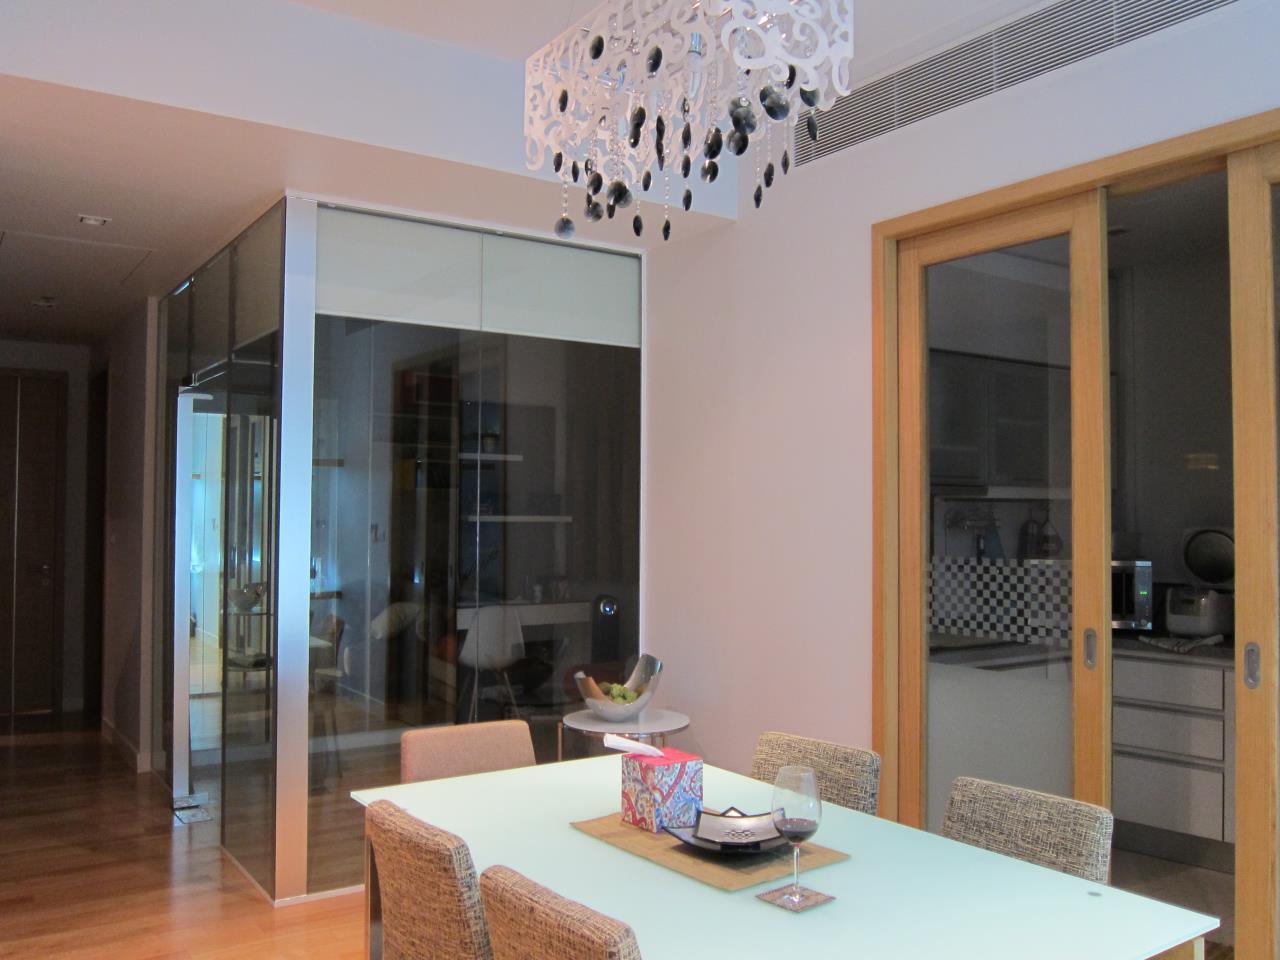 Piri Property Agency's 2 bedrooms Condominium  on tower B floor For Rent 2 8